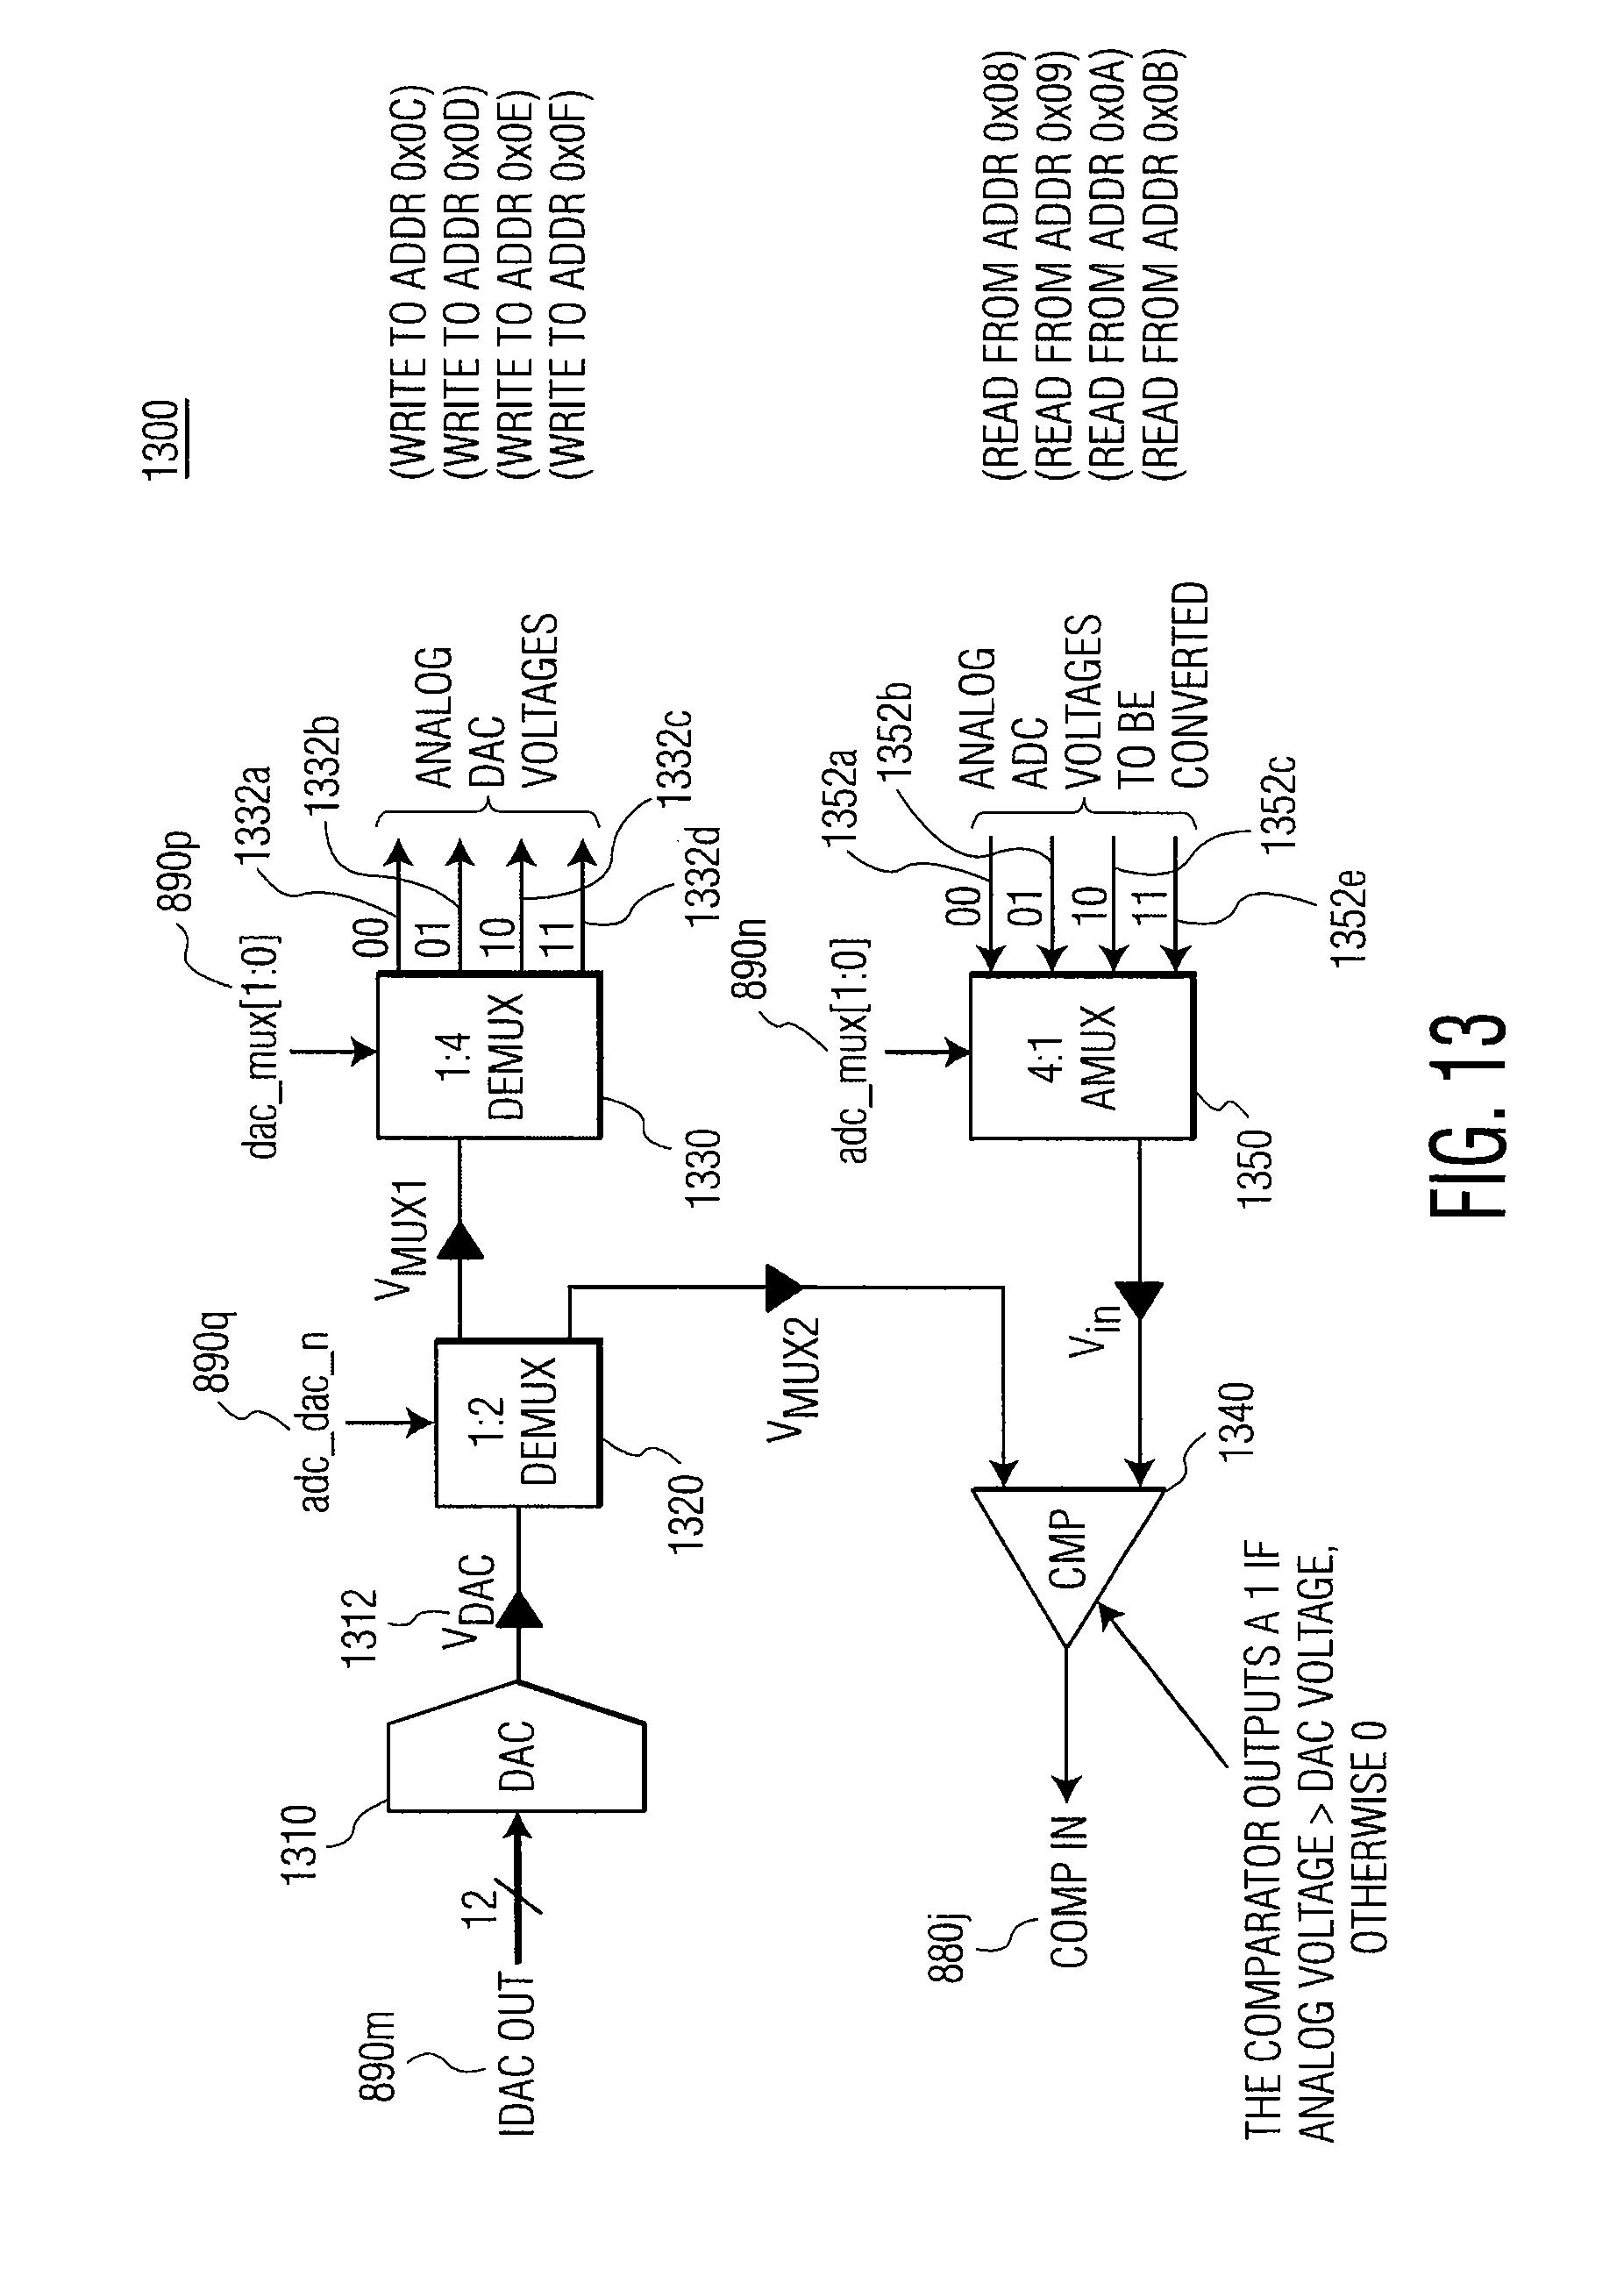 Patent Us20090140901 Risa Controller For An Rf Integrated Circuit Logic Diagram 2 Bit Demultiplexer Drawing